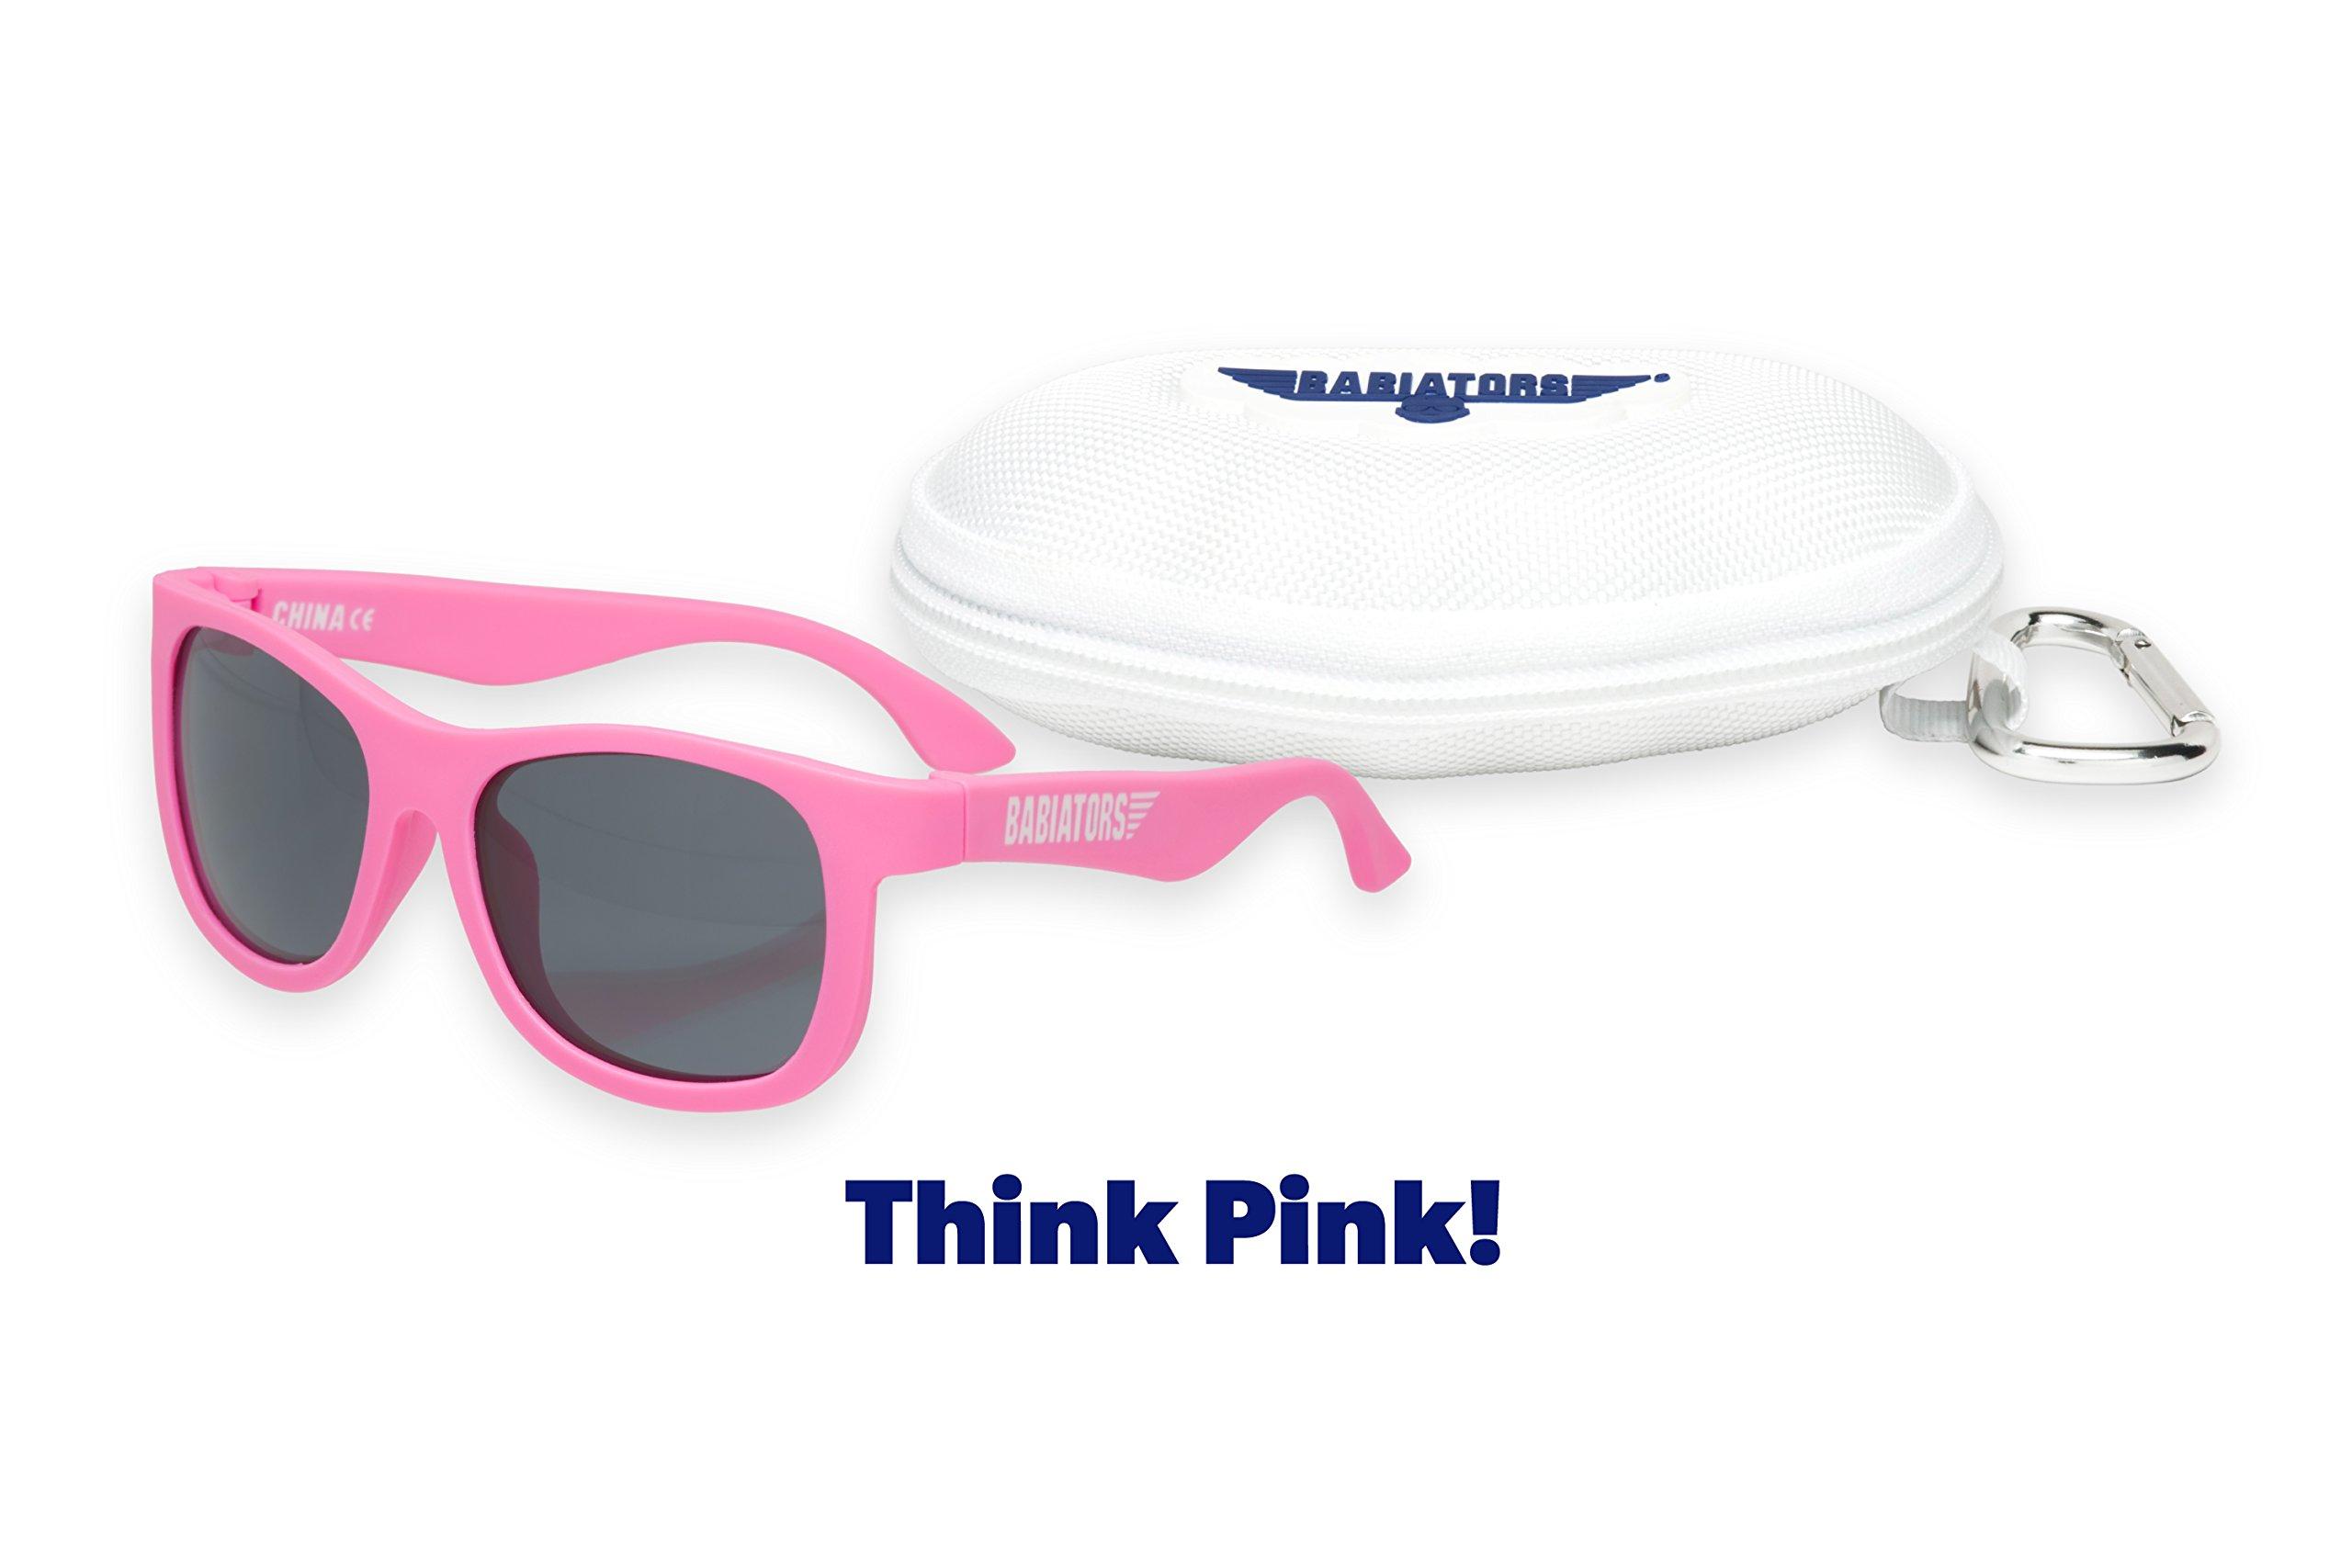 1efa559e7cd Amazon.com  Babiators Gift Set - Blue Crush Navigator Sunglasses ...